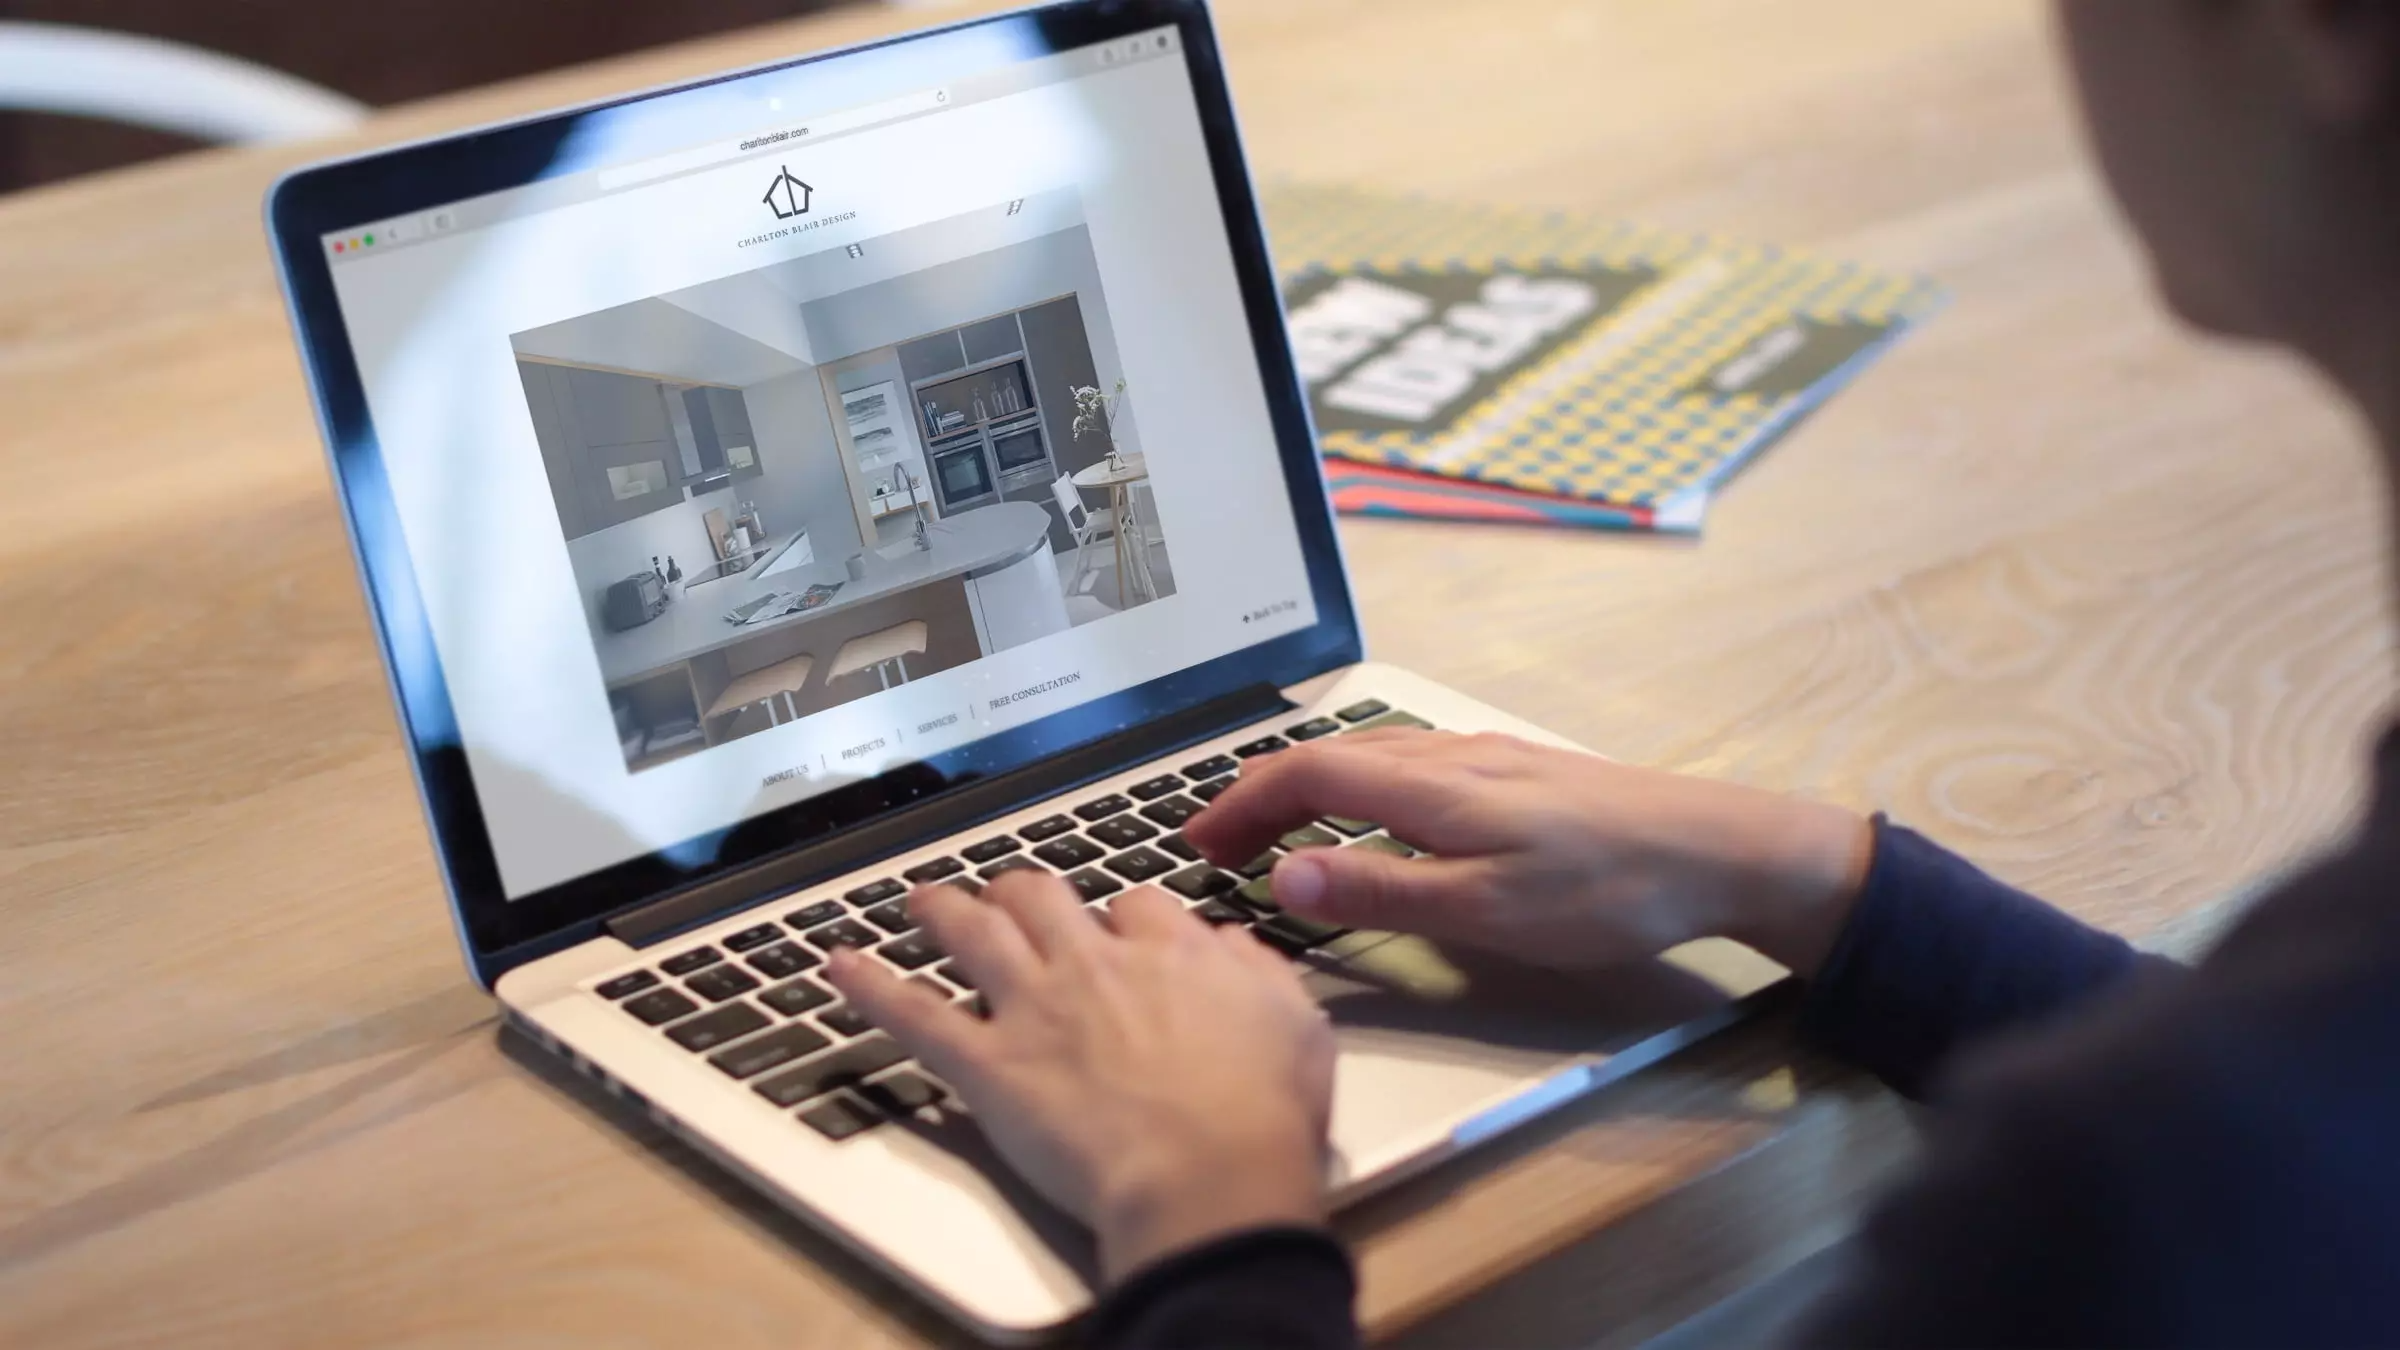 Charlton Blair website being viewed on a laptop screen